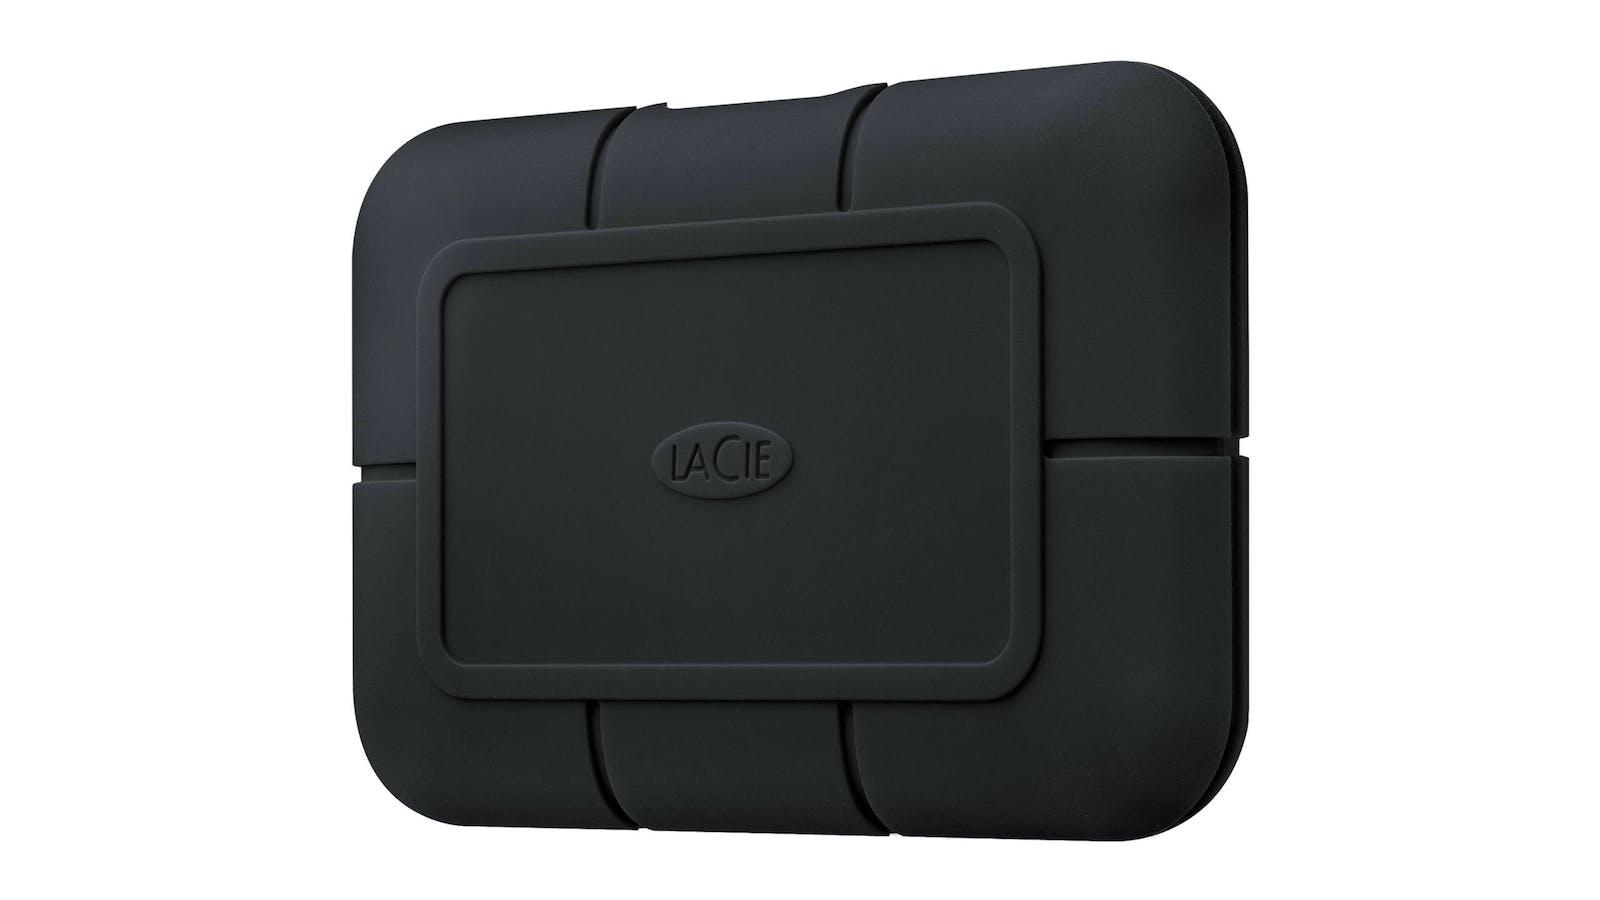 LaCie Rugged SSD Pro hard drive